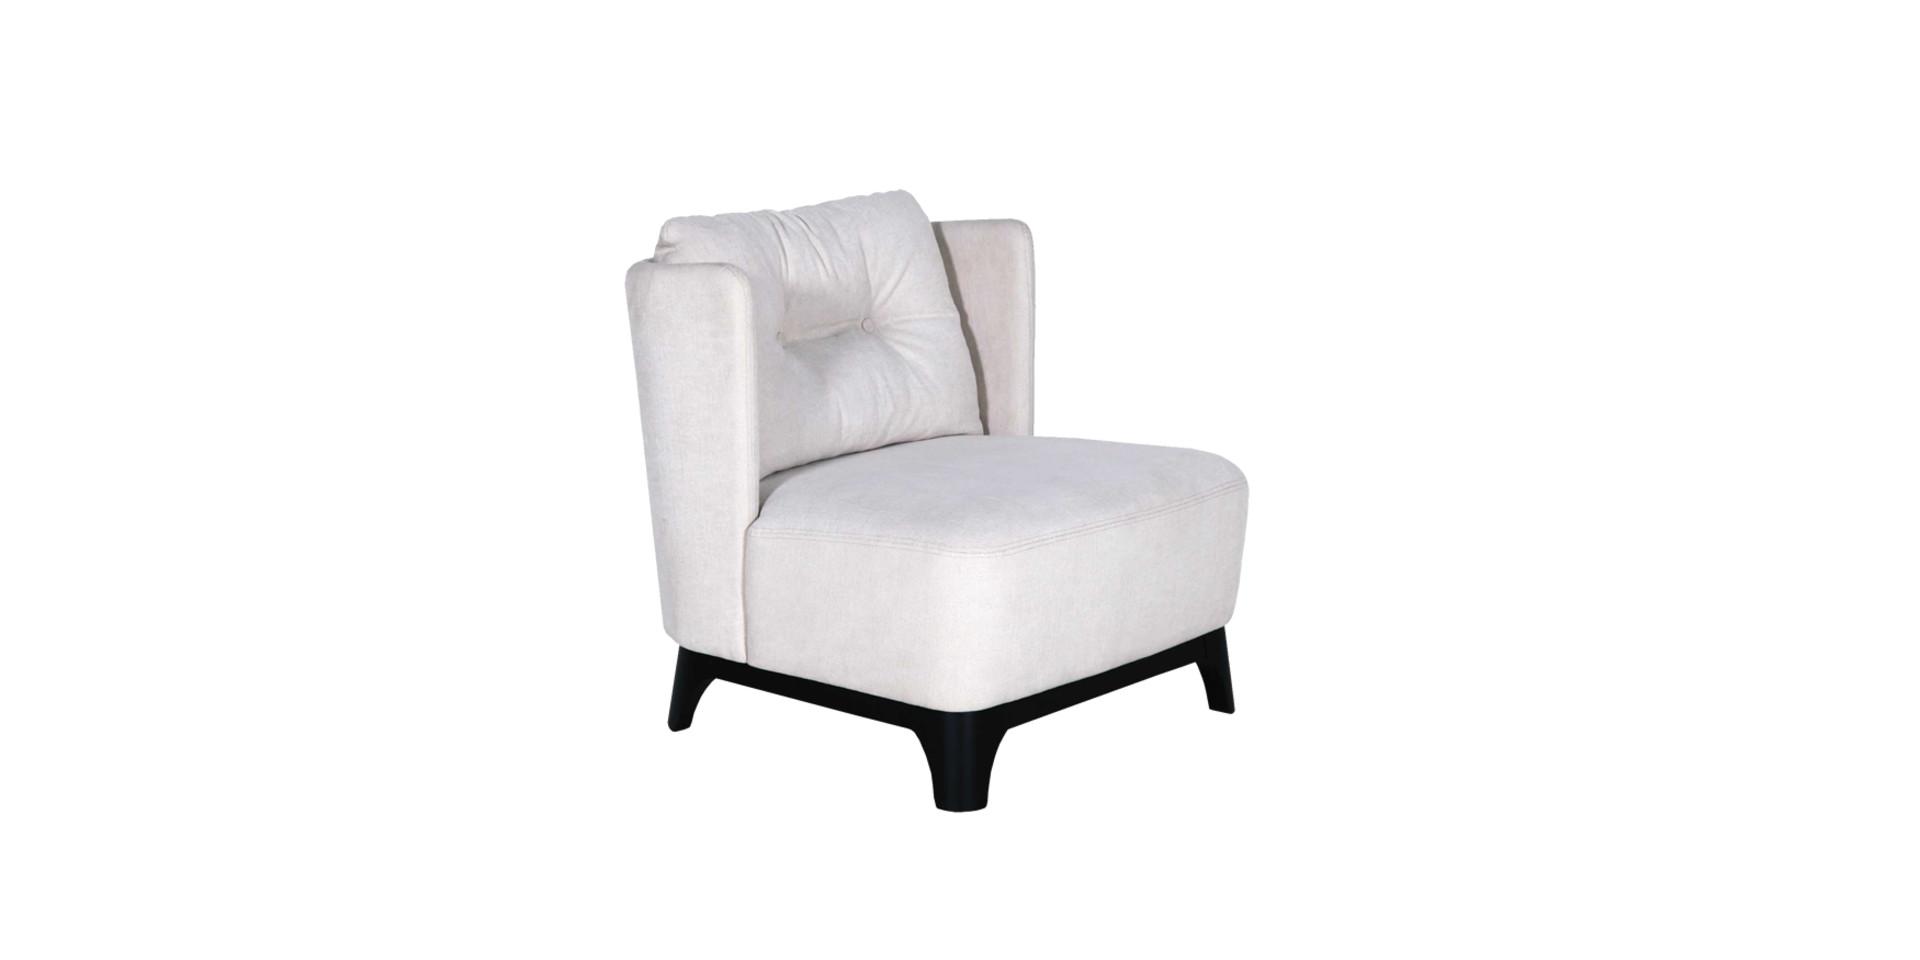 sits-alma-fauteuil-armchair_buttons_caleido1419_natur_2